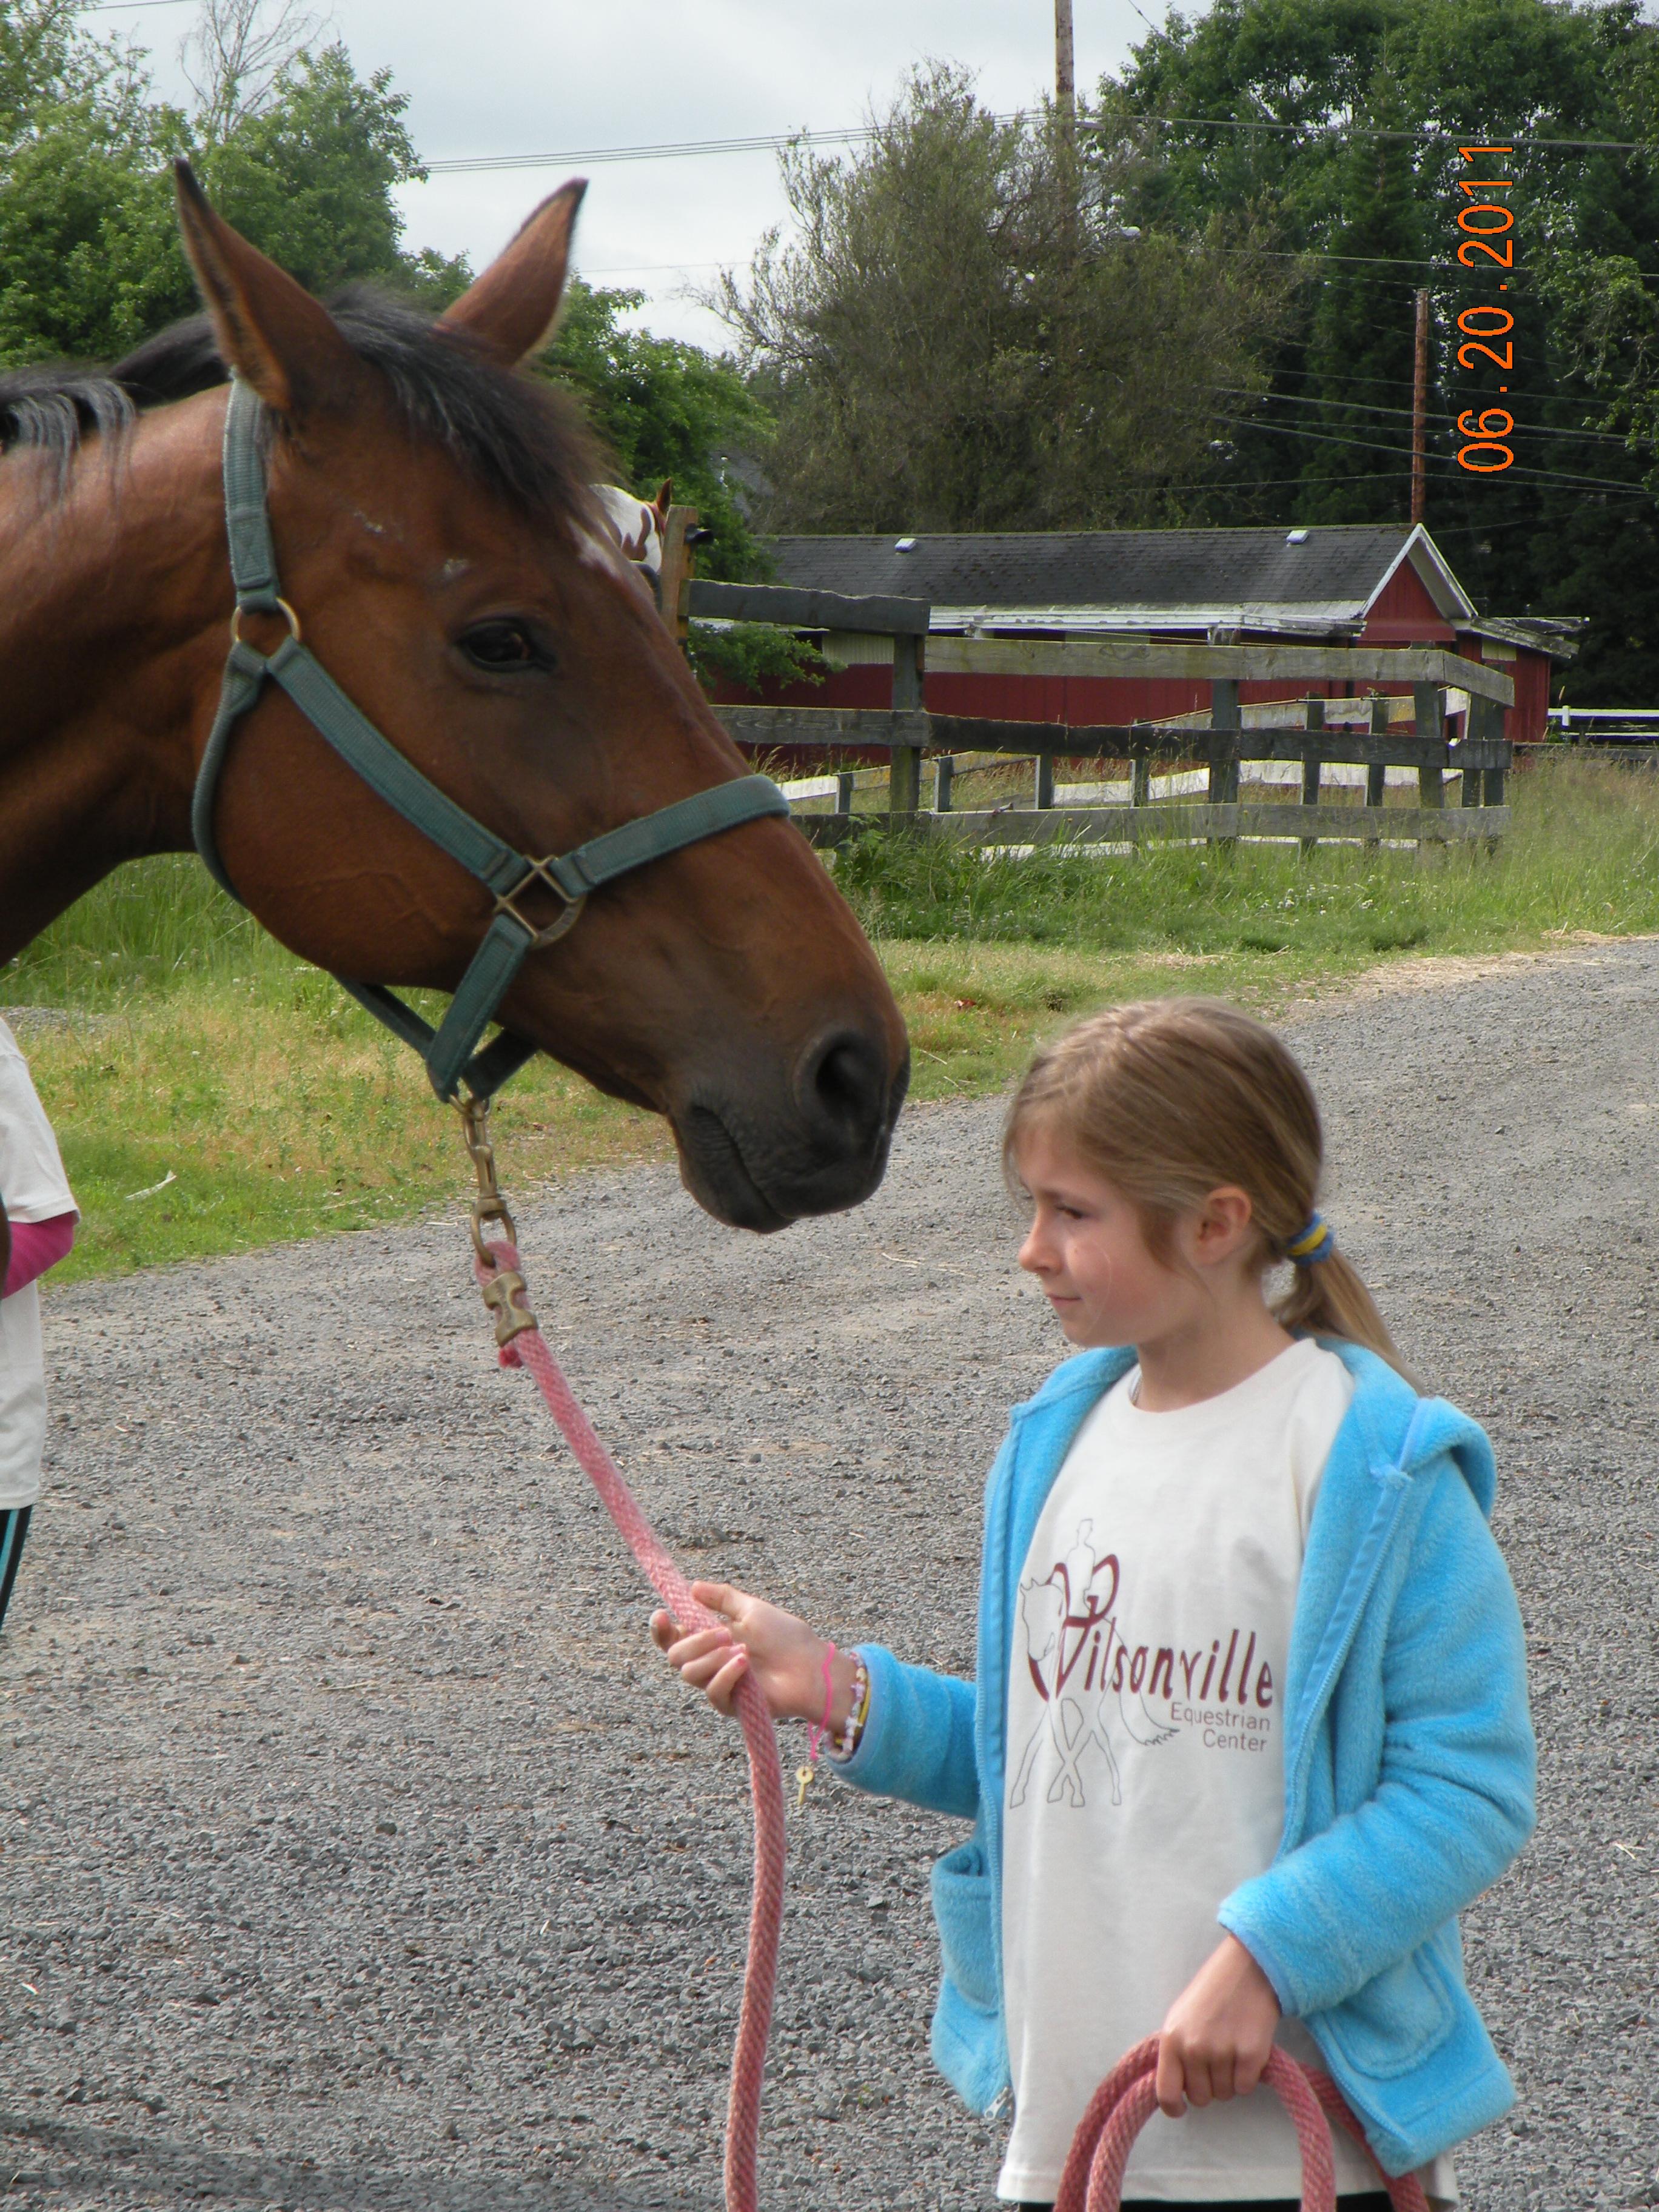 Wilsonville Equestrian Center